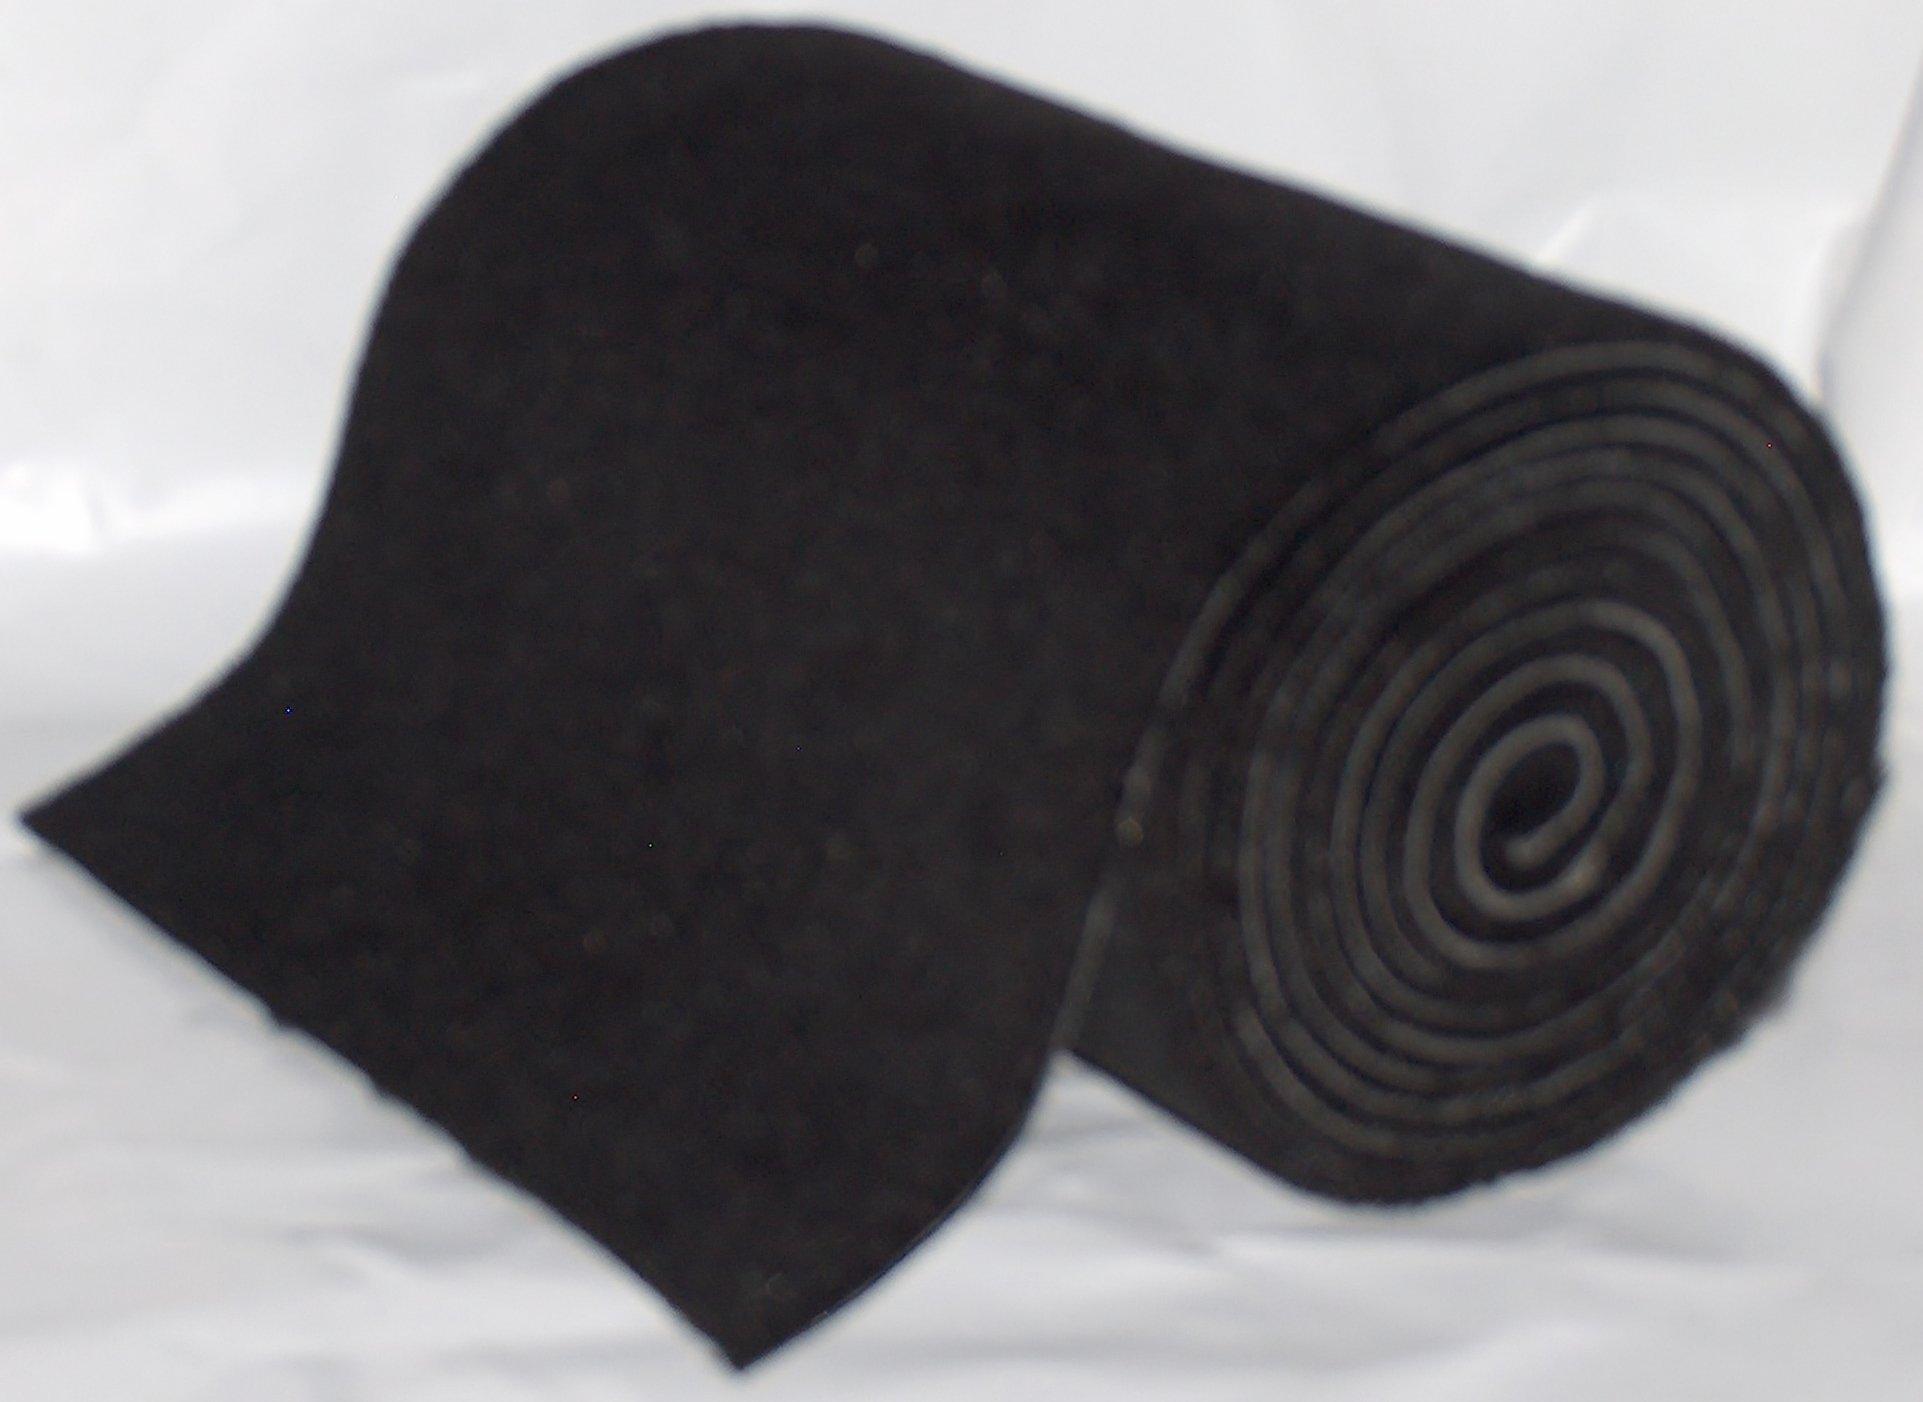 Trailer Carpet Stabilized Retention Polypropylene